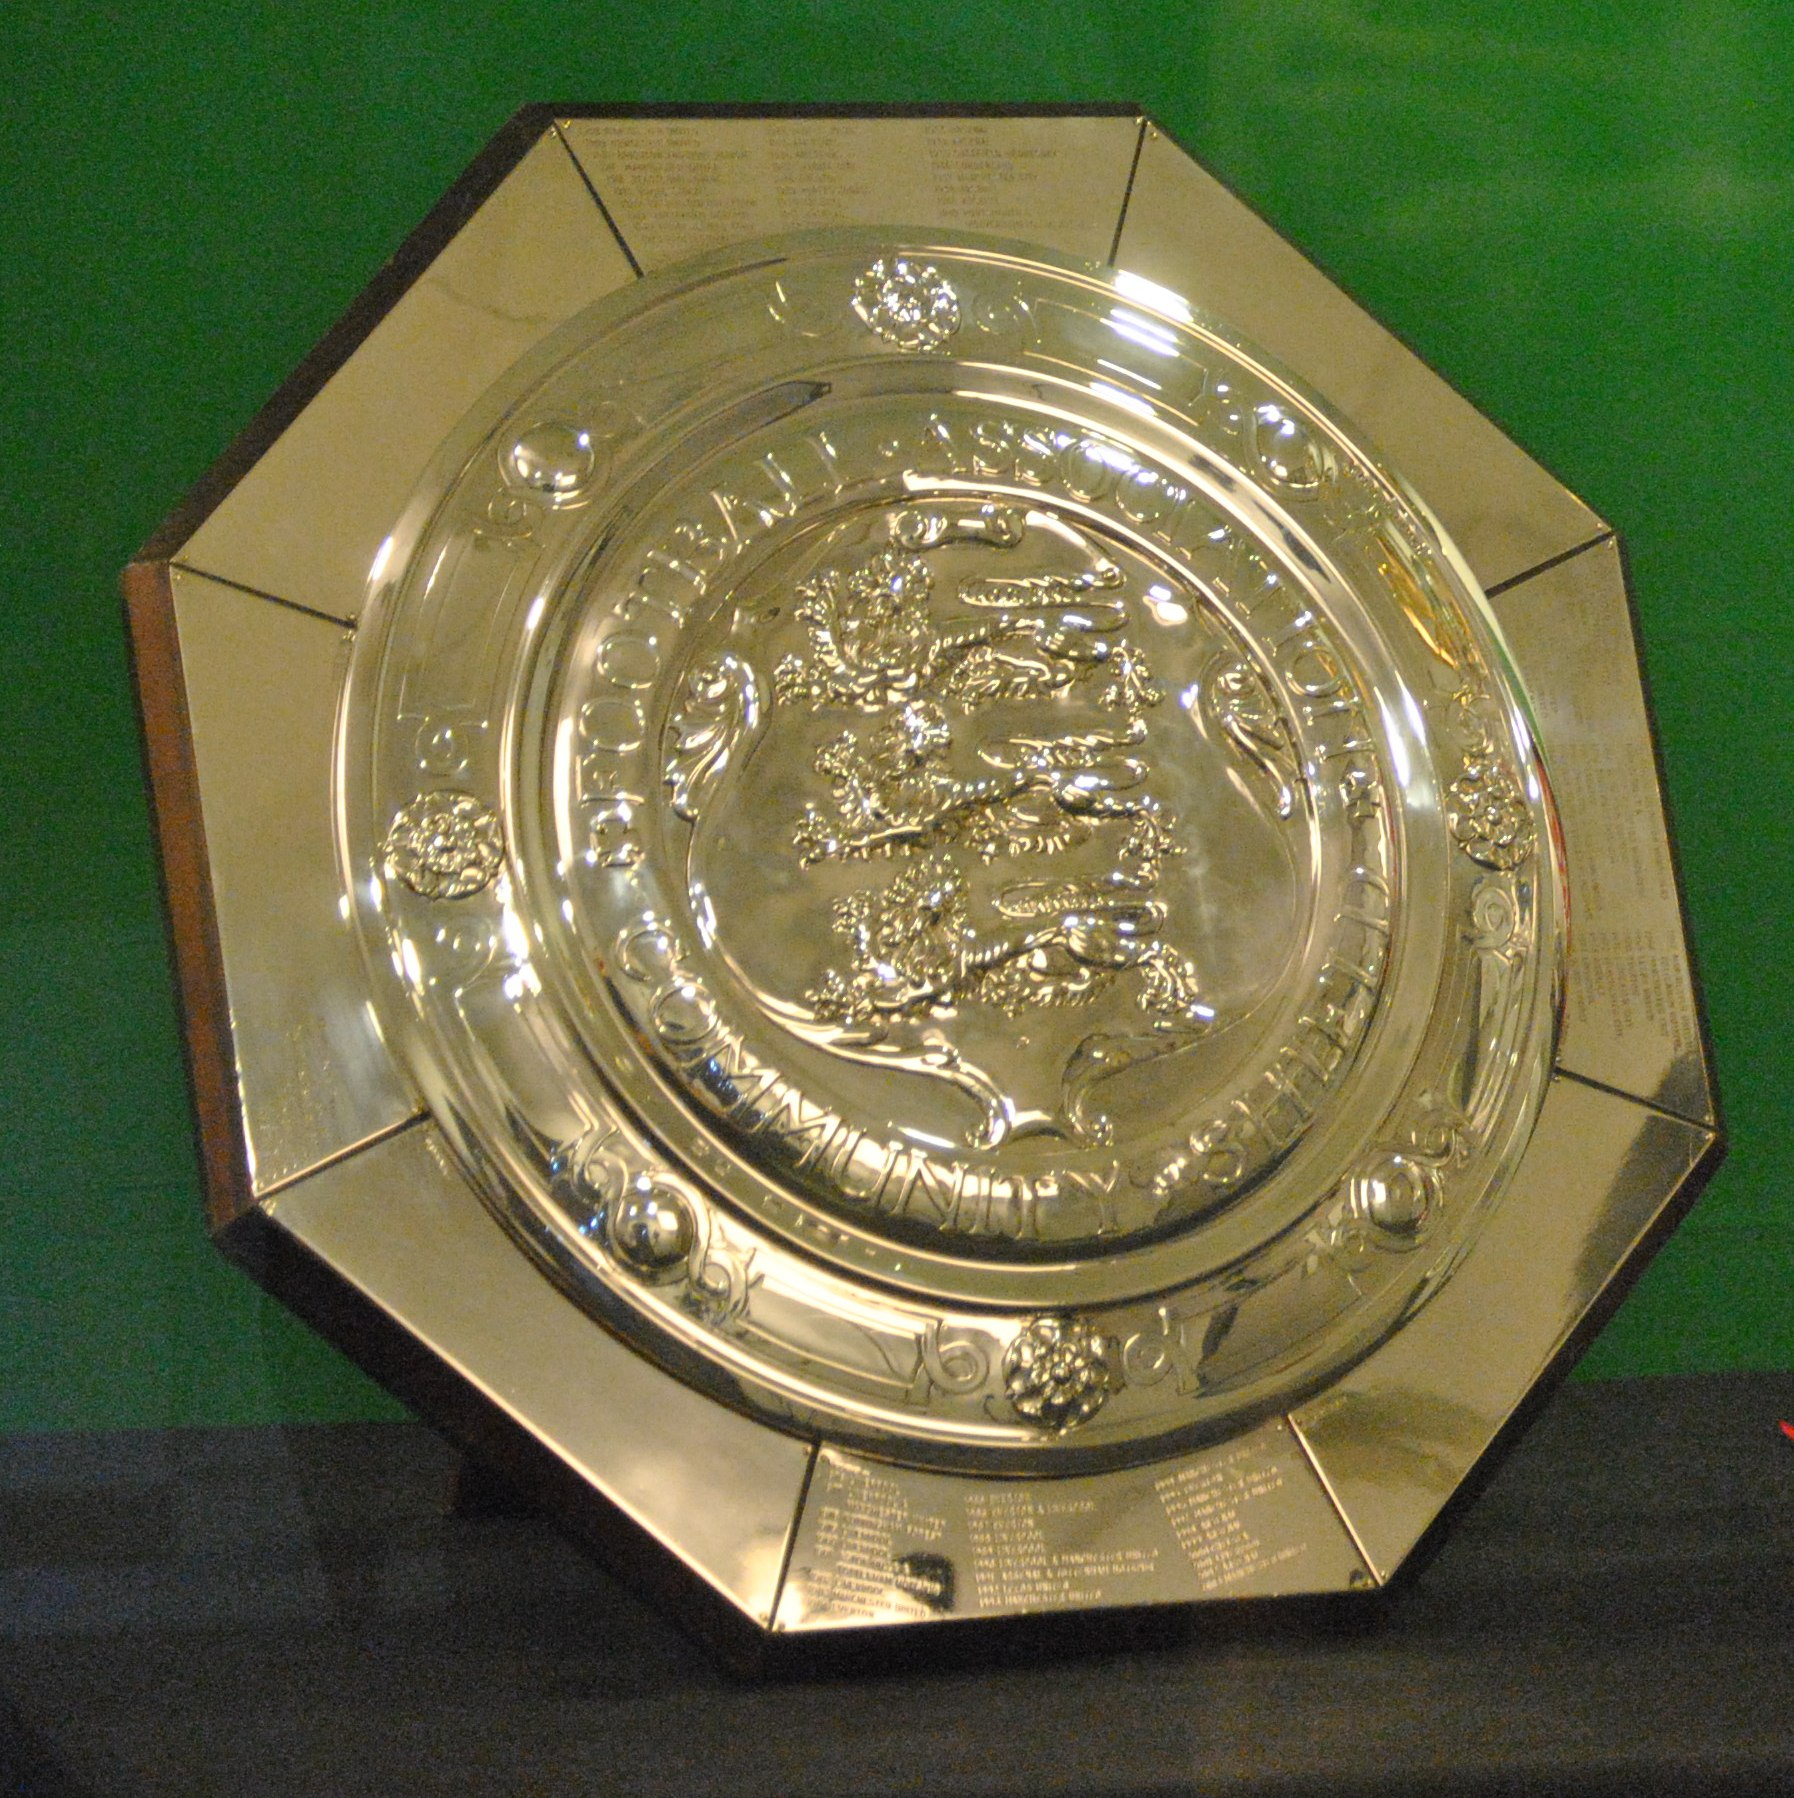 charity shield